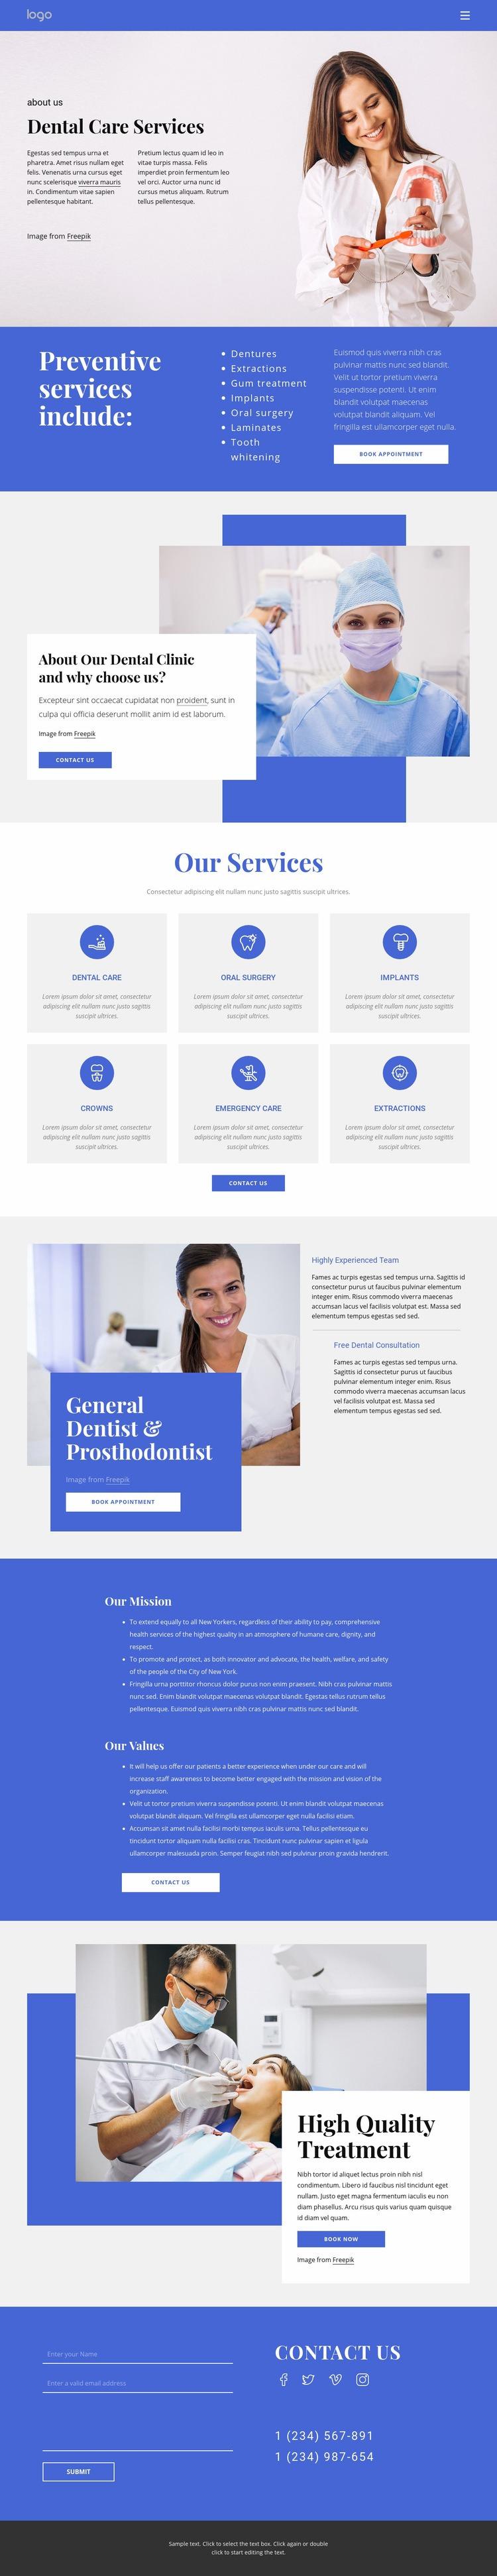 Dentist and prosthodontics Web Page Designer